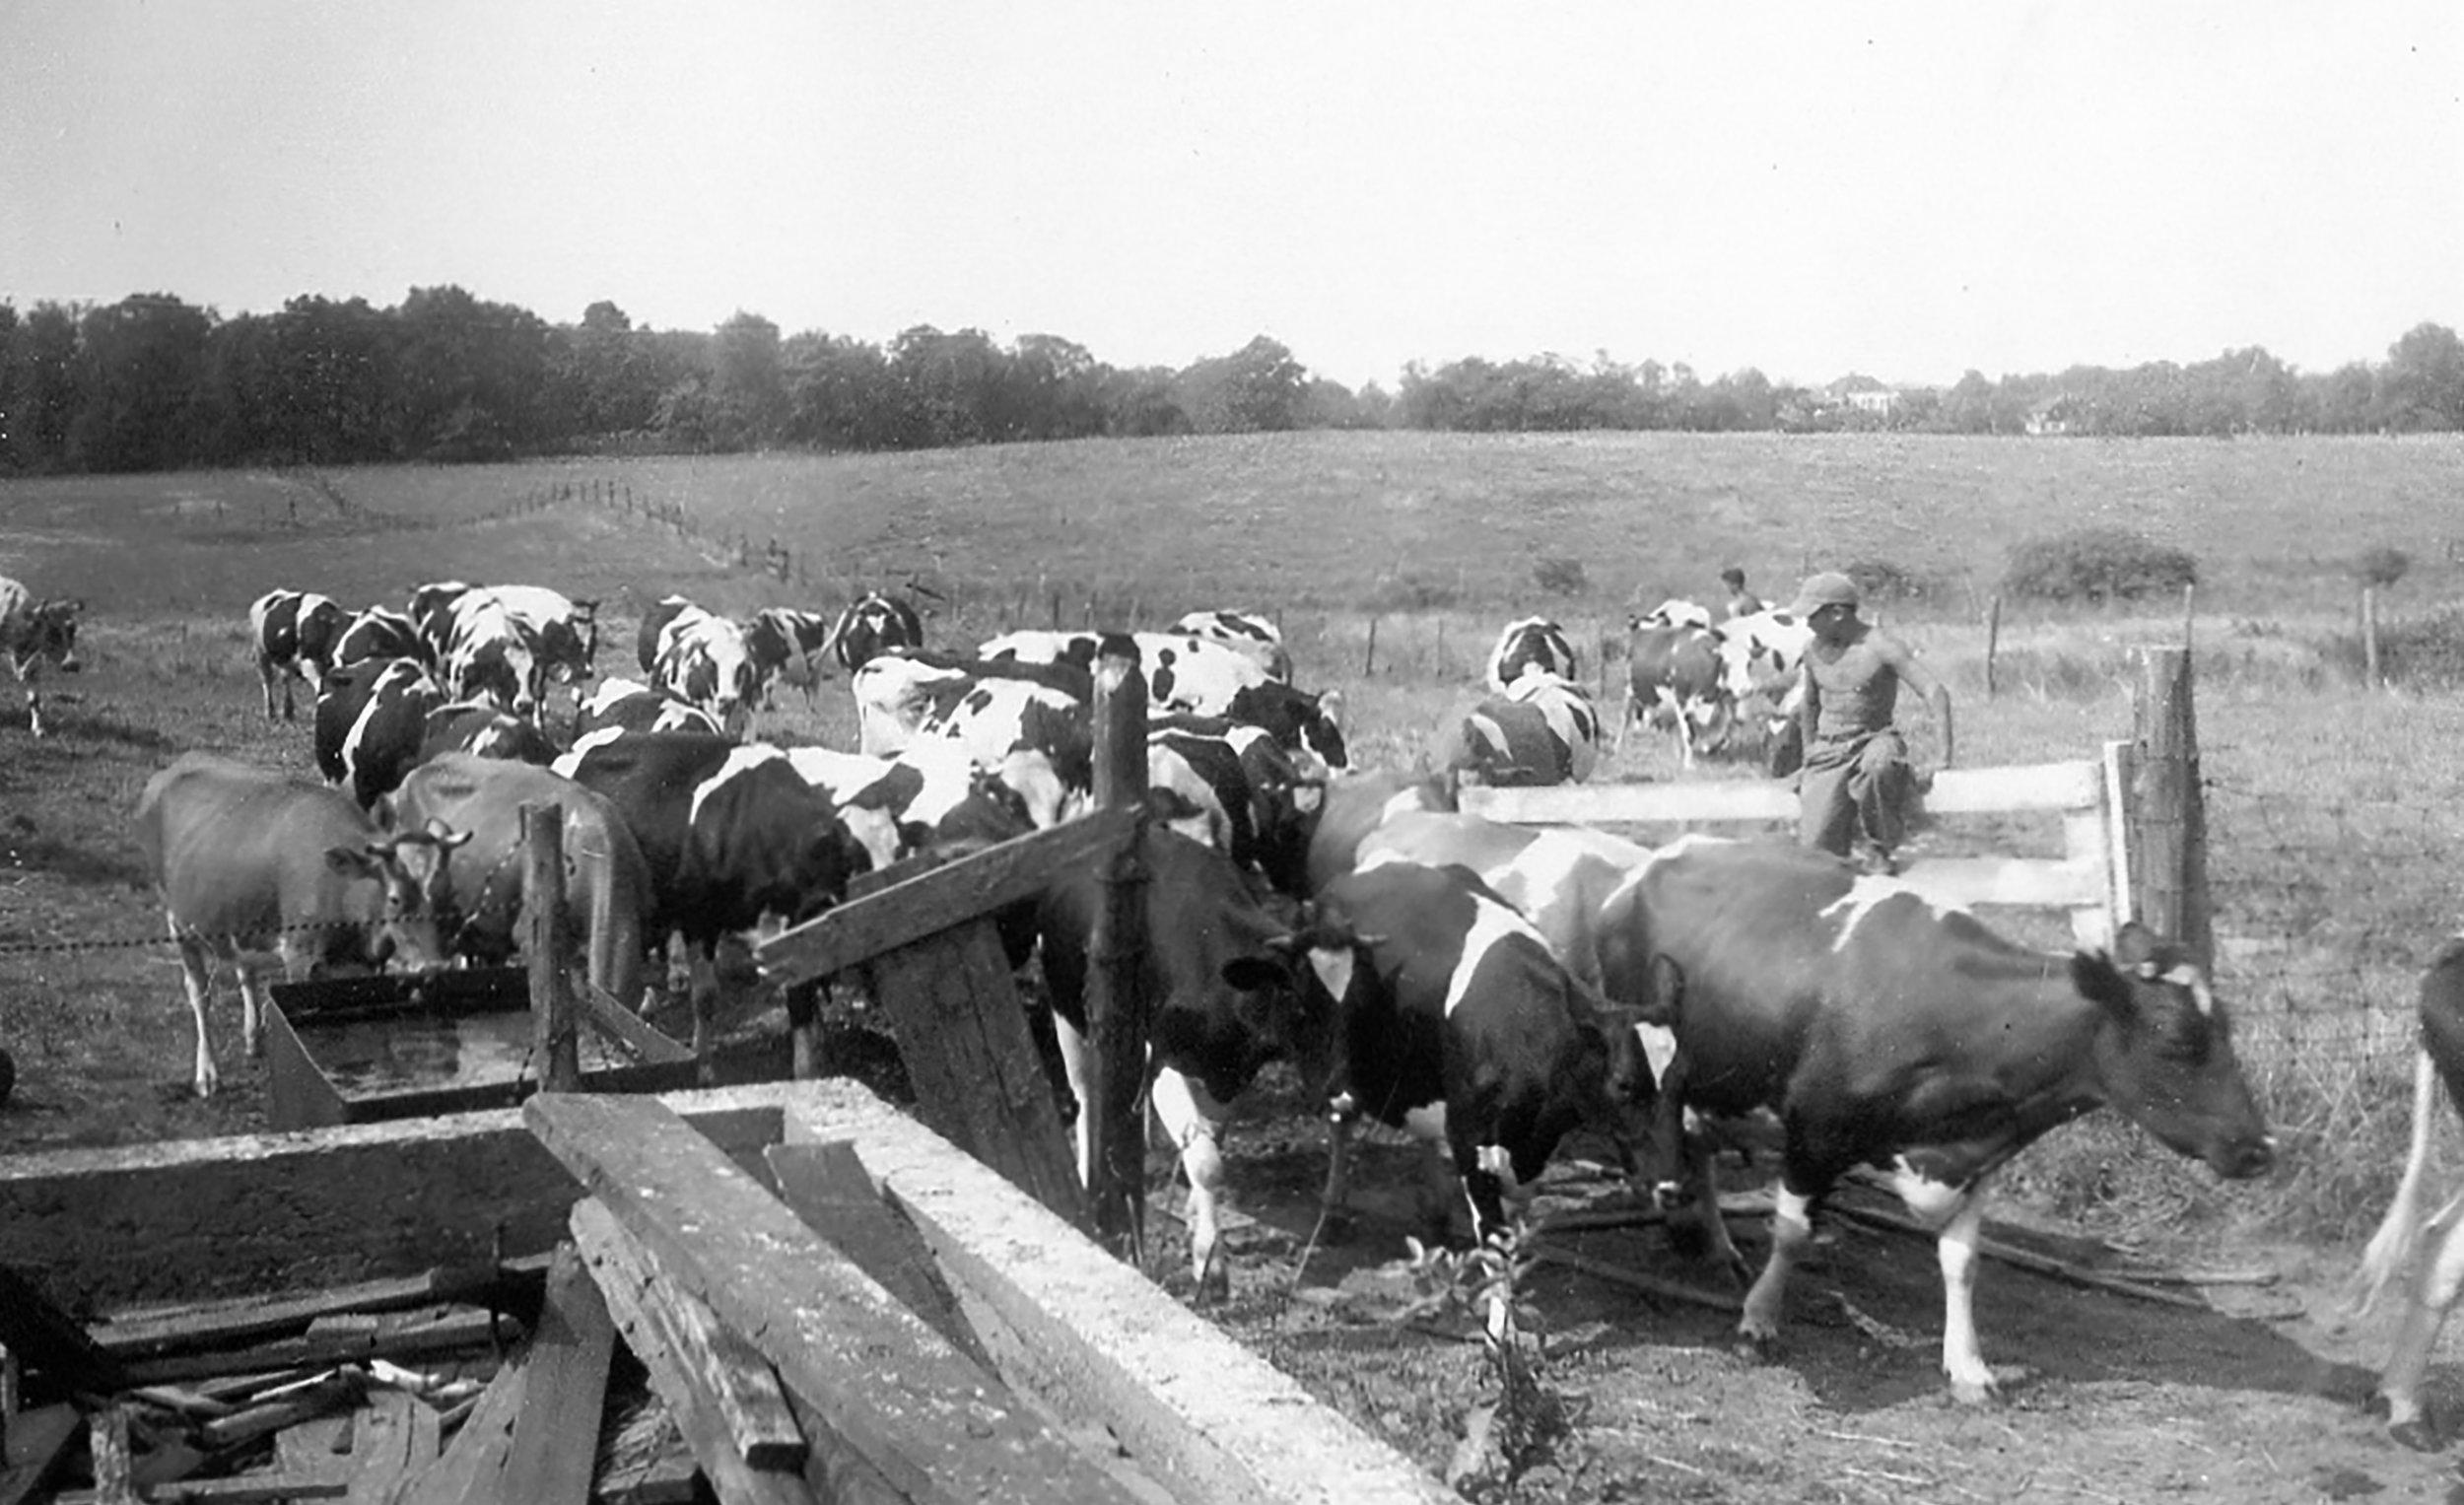 122_Mt. Loretto_July 1939 (2).jpg